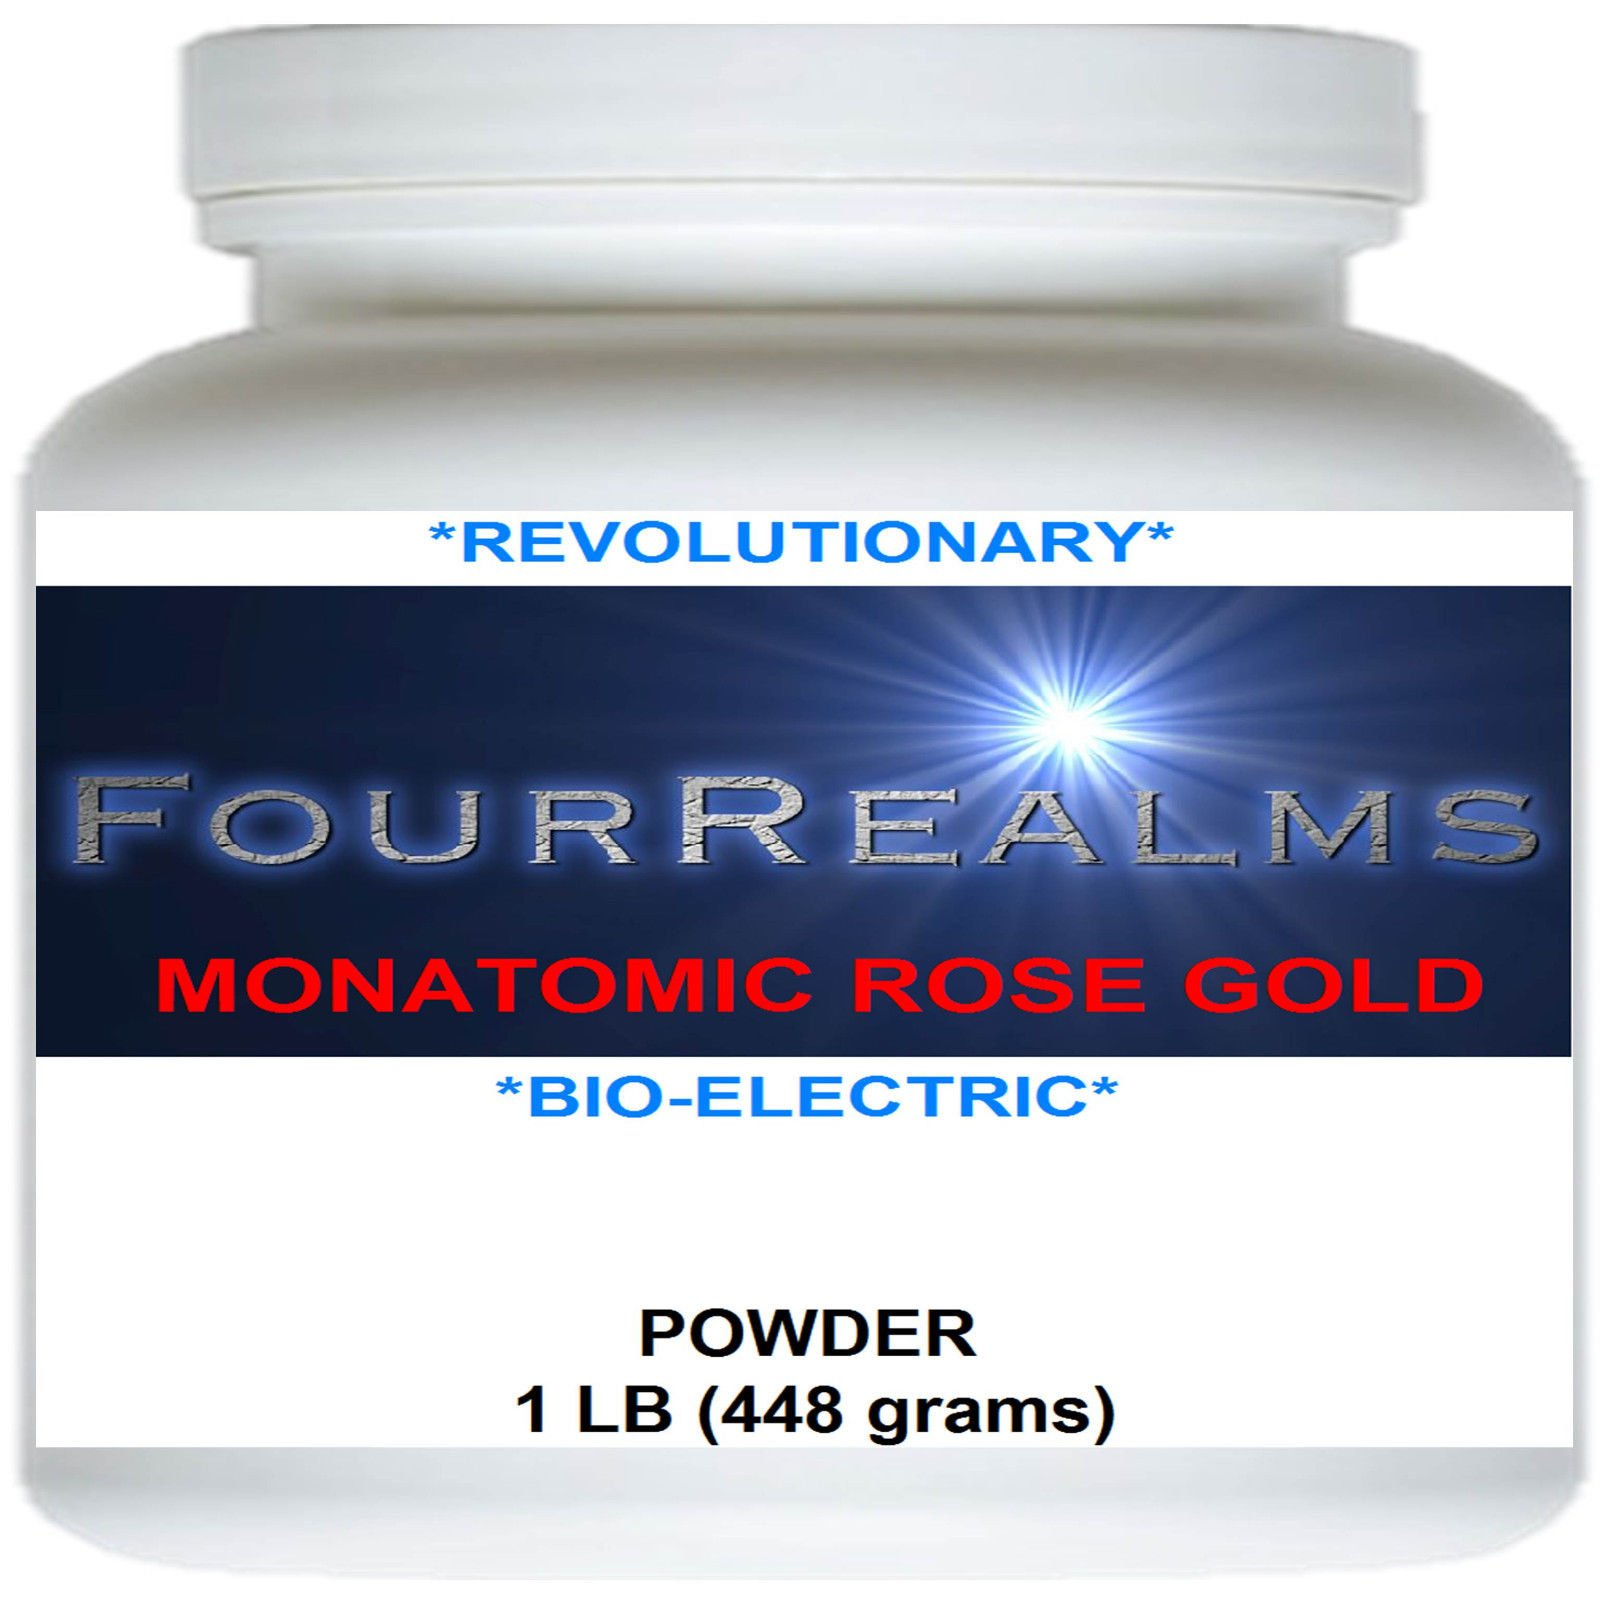 Monatomic Rose Gold - 448 grams (1lb) - Most Potent ORMUS!